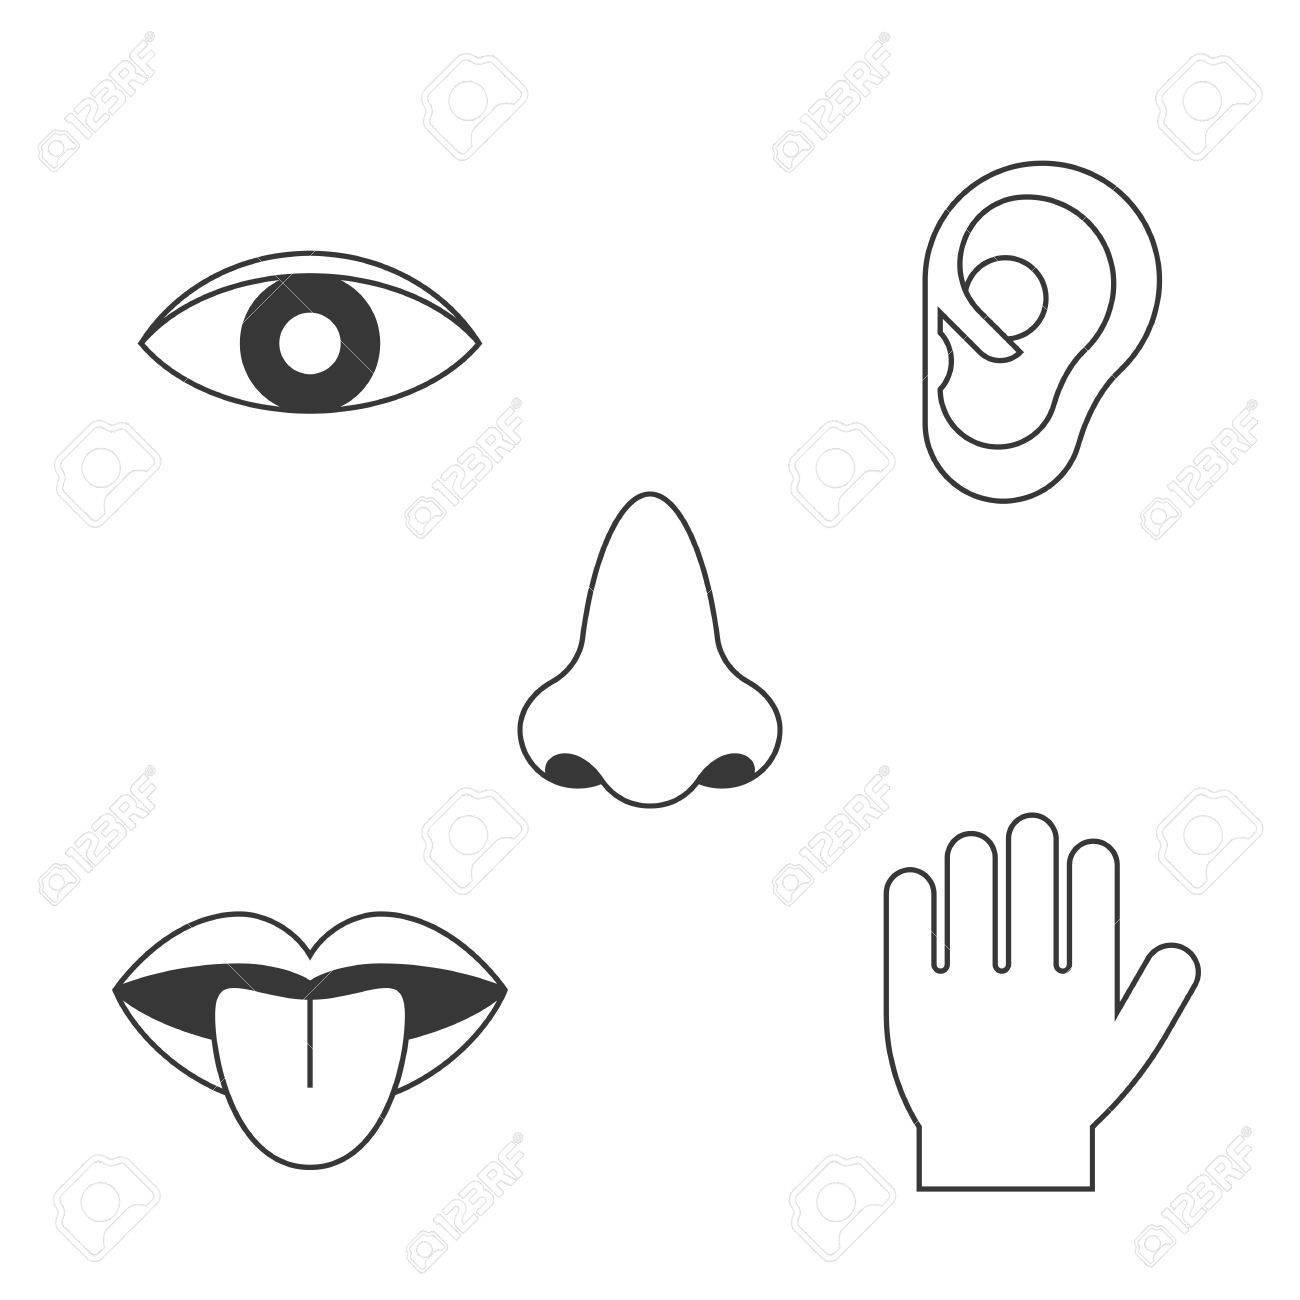 Sense of taste clipart black and white clip art freeuse Sense of taste clipart black and white 5 » Clipart Portal clip art freeuse